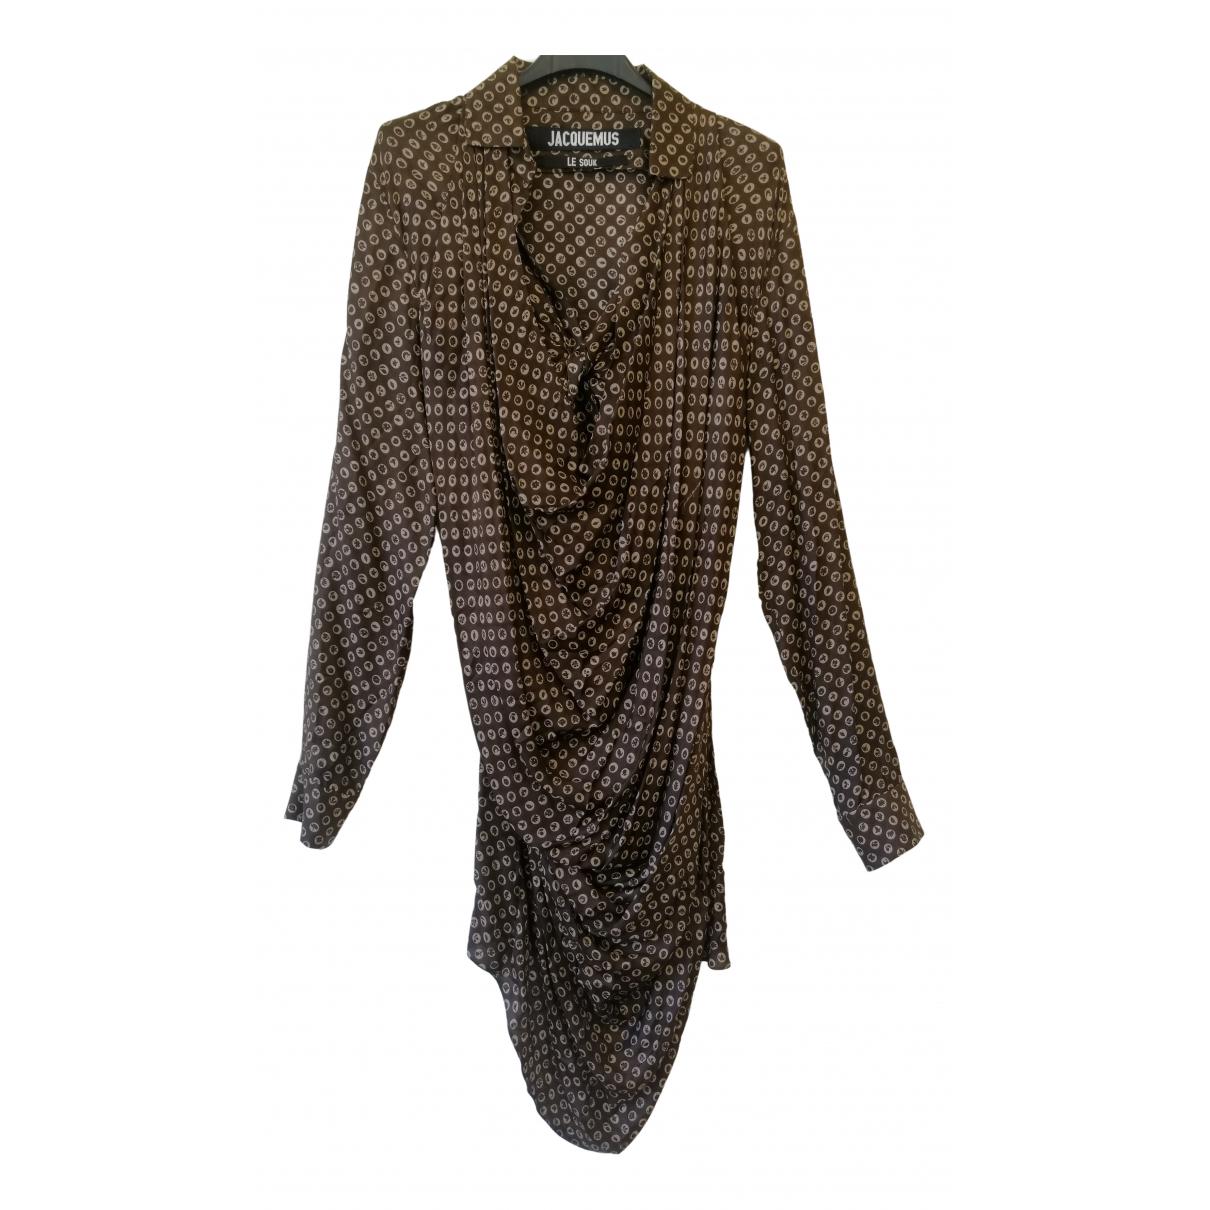 Jacquemus Le Souk Brown Silk dress for Women S International